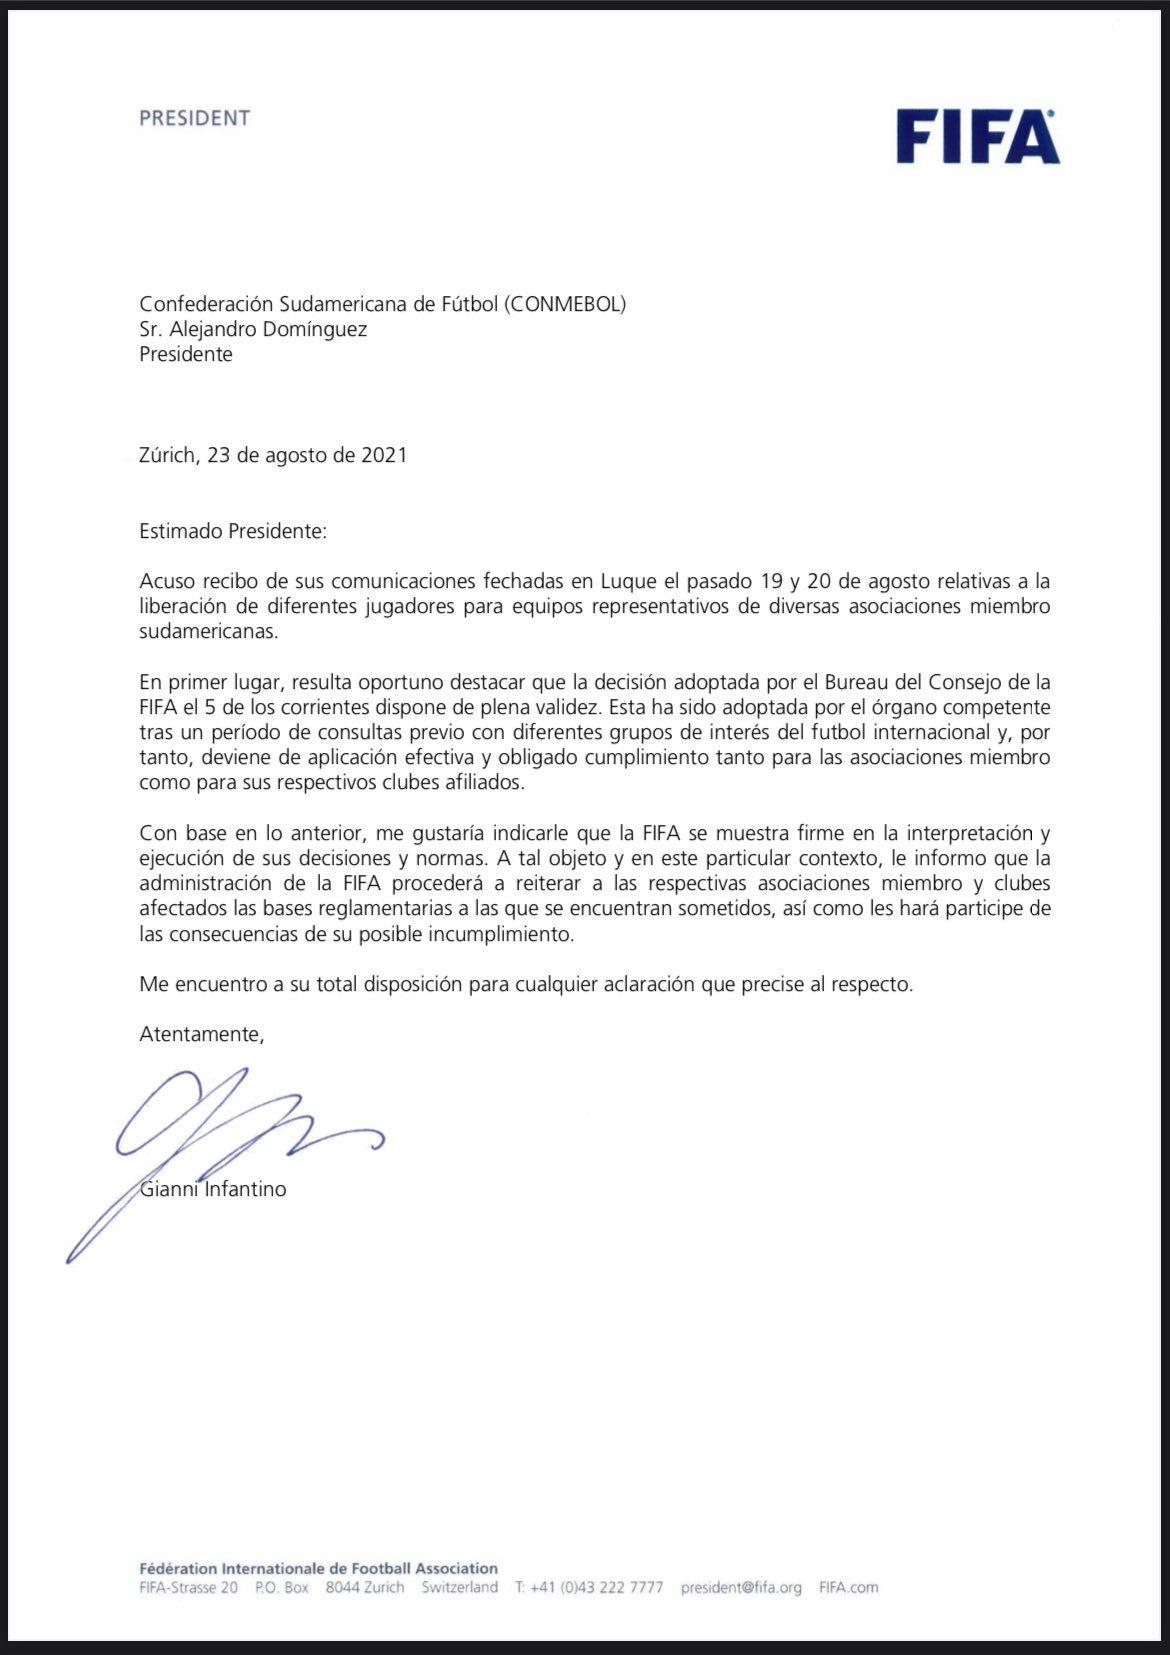 Carta del presidente de la FIFA, Gianni Infantino, al presidente de la Conmebol